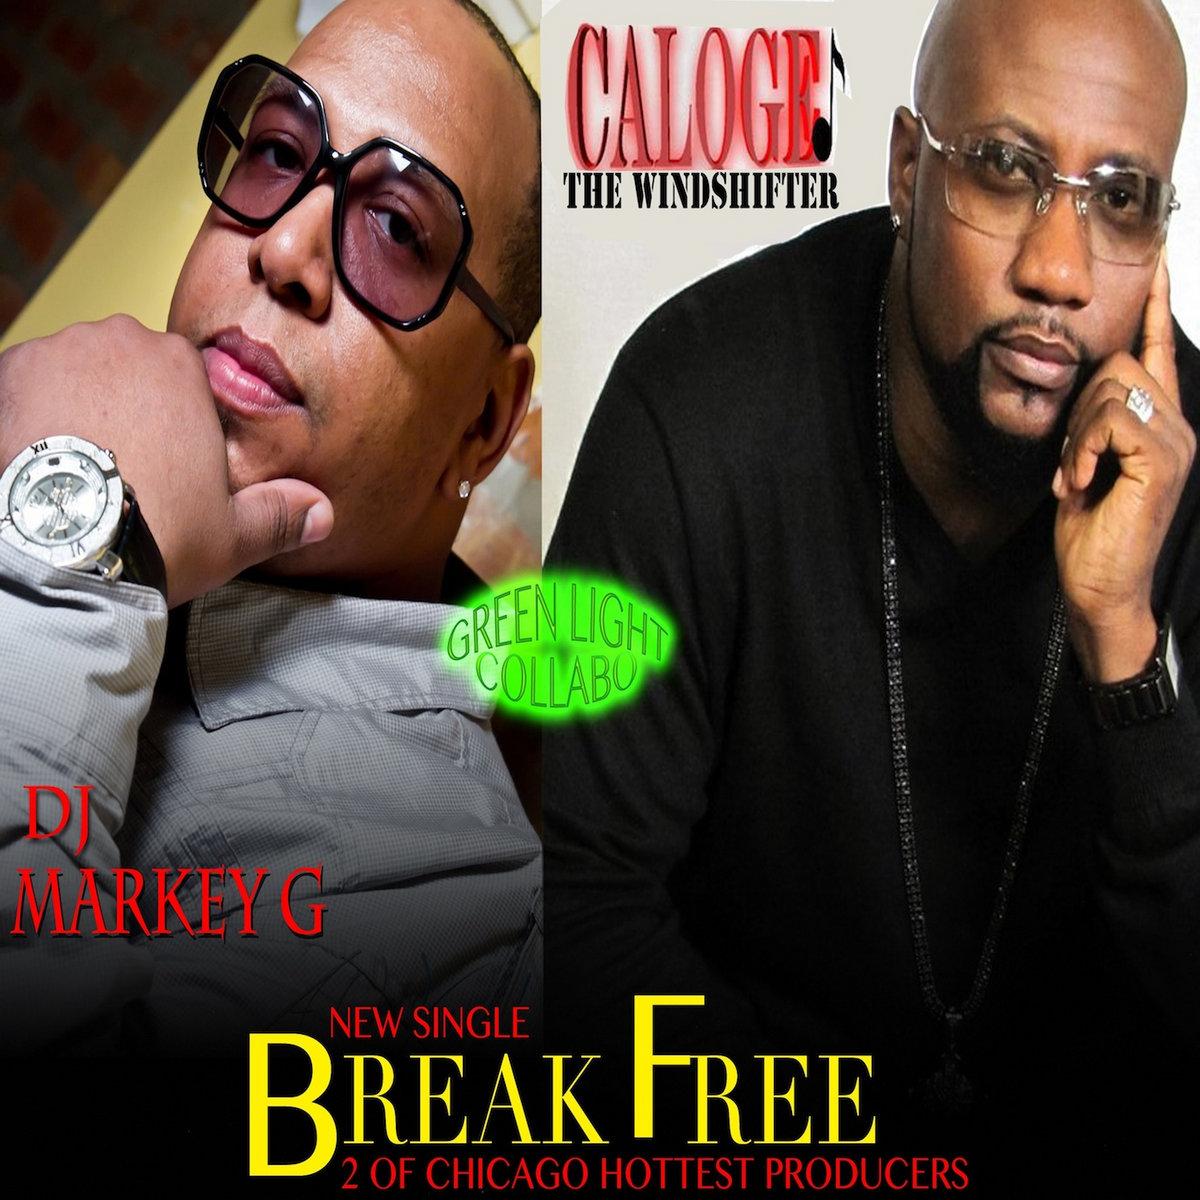 Break Free - Dj Markey G & Caloge The Windshifter by Dj Markey G & Caloge The Windshifter